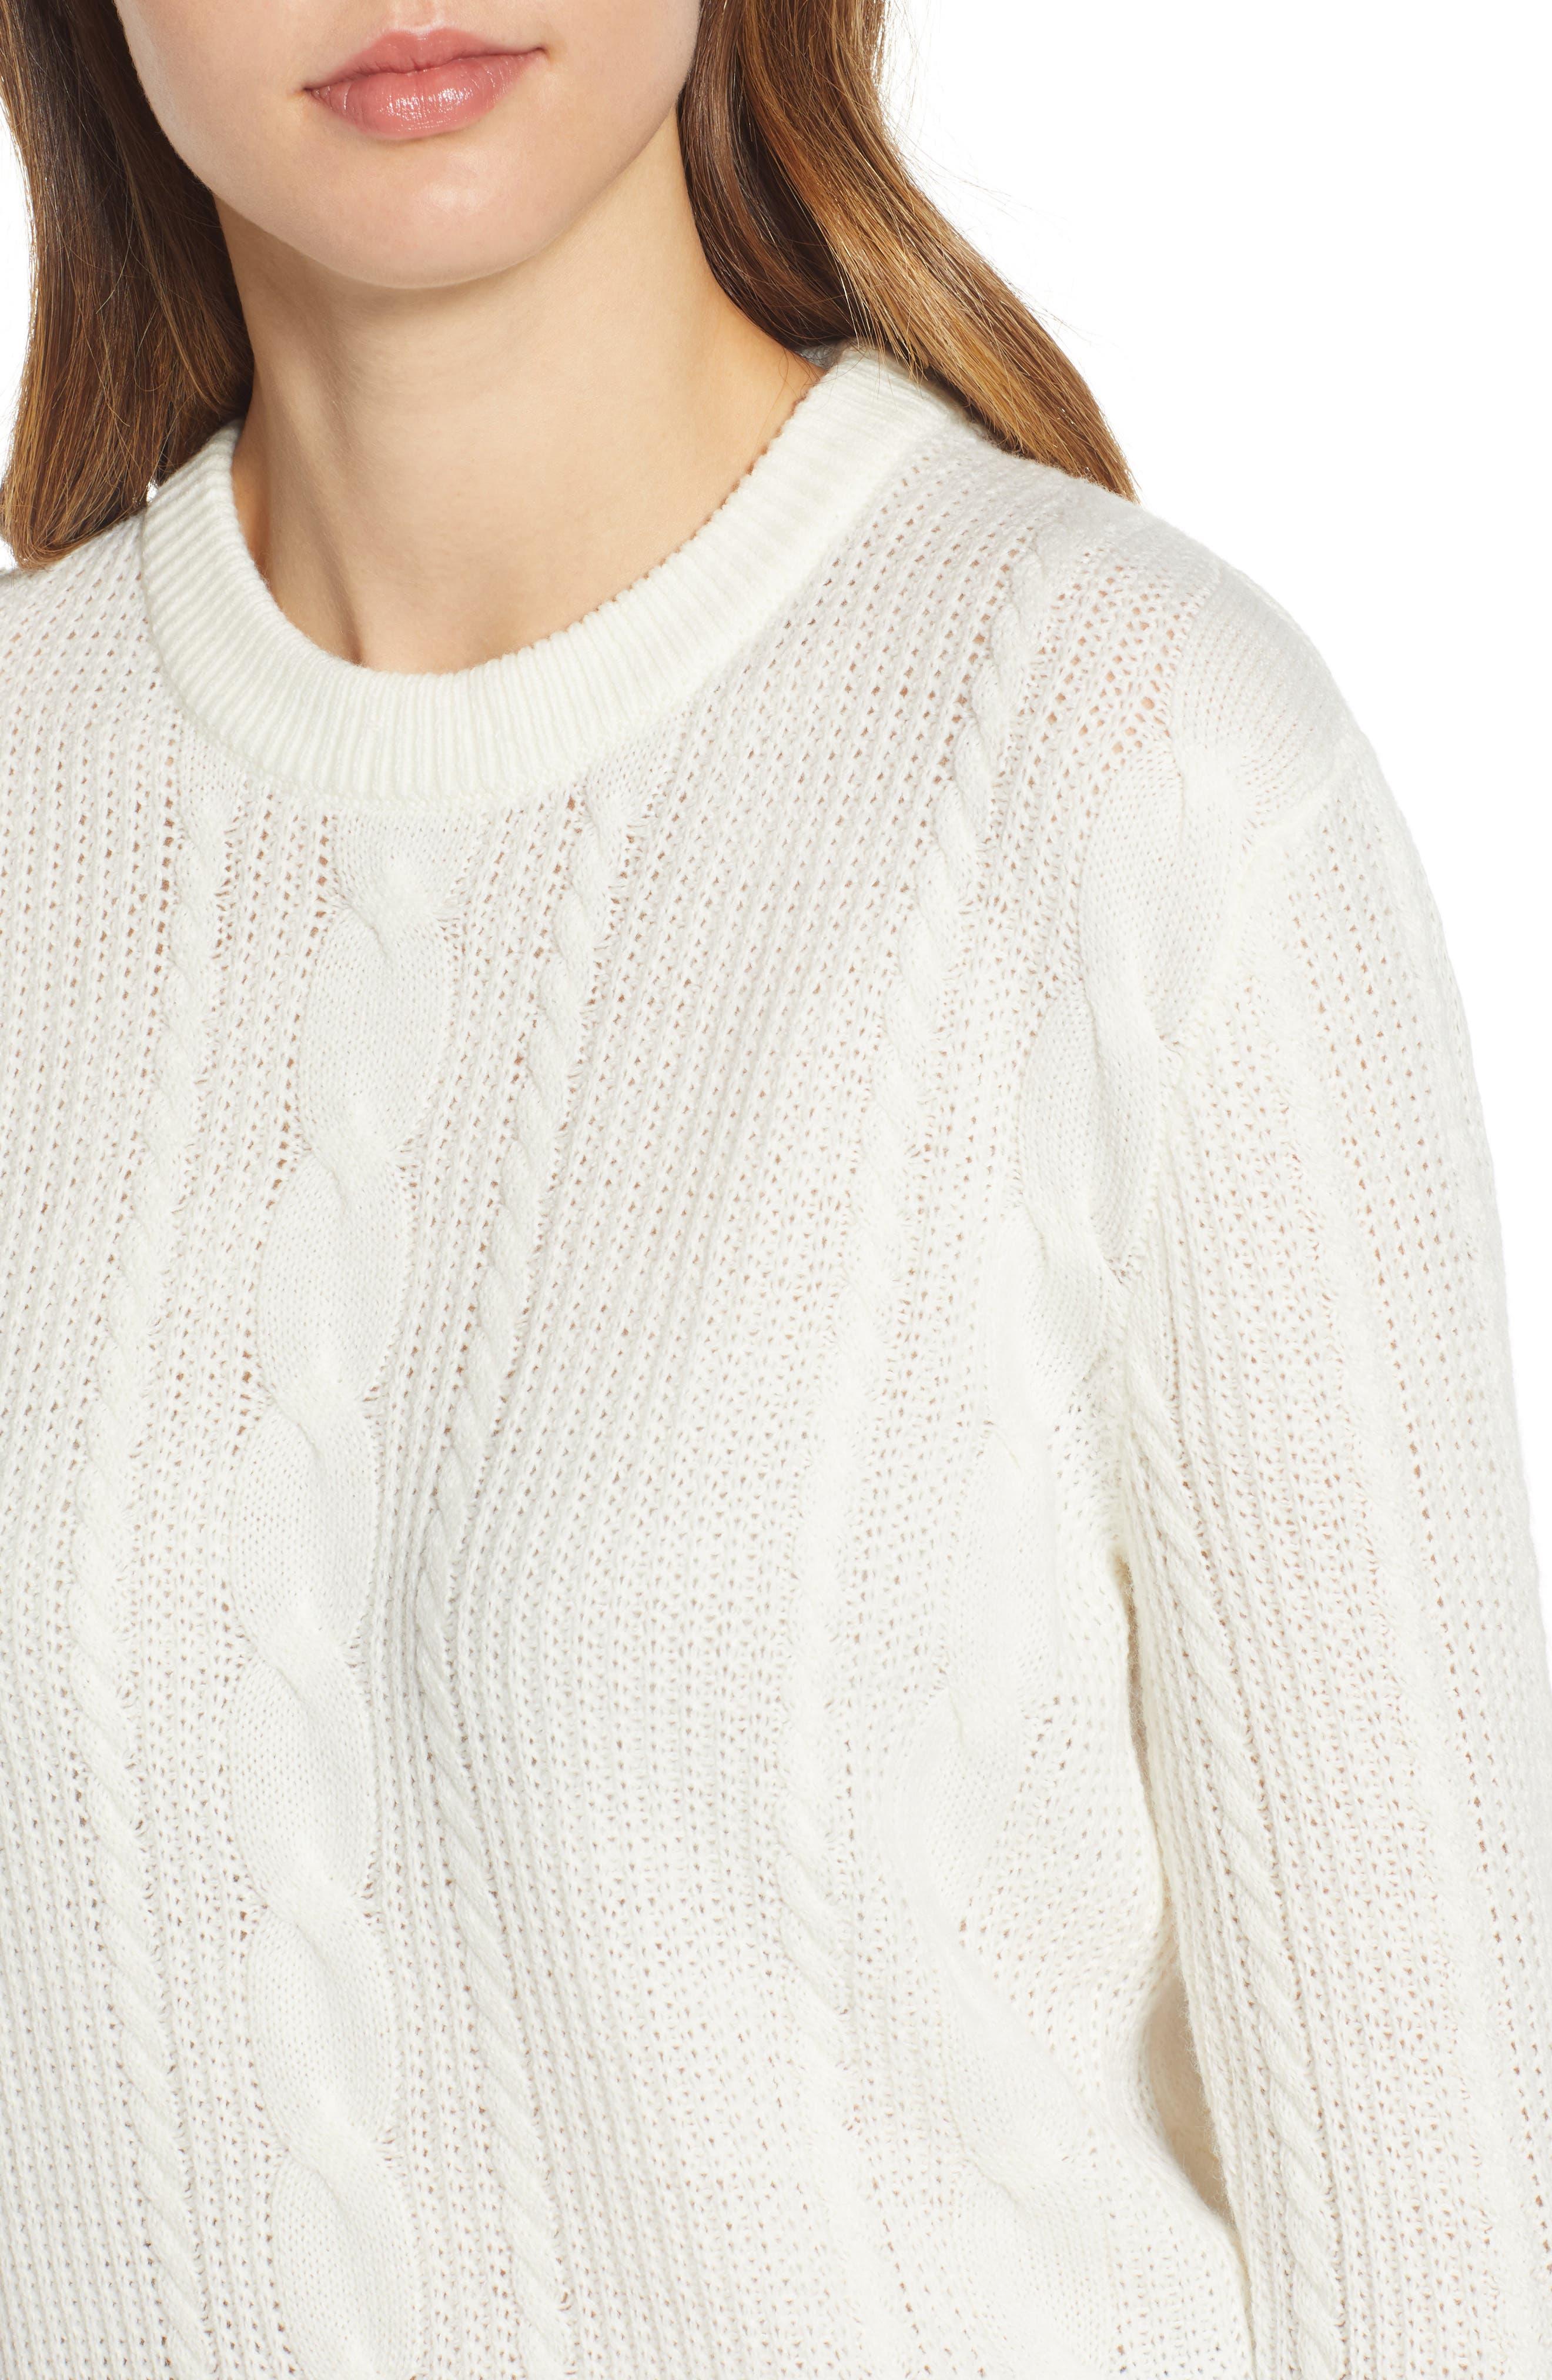 TJW Cable Knit Sweater,                             Alternate thumbnail 4, color,                             CLOUD DANCER